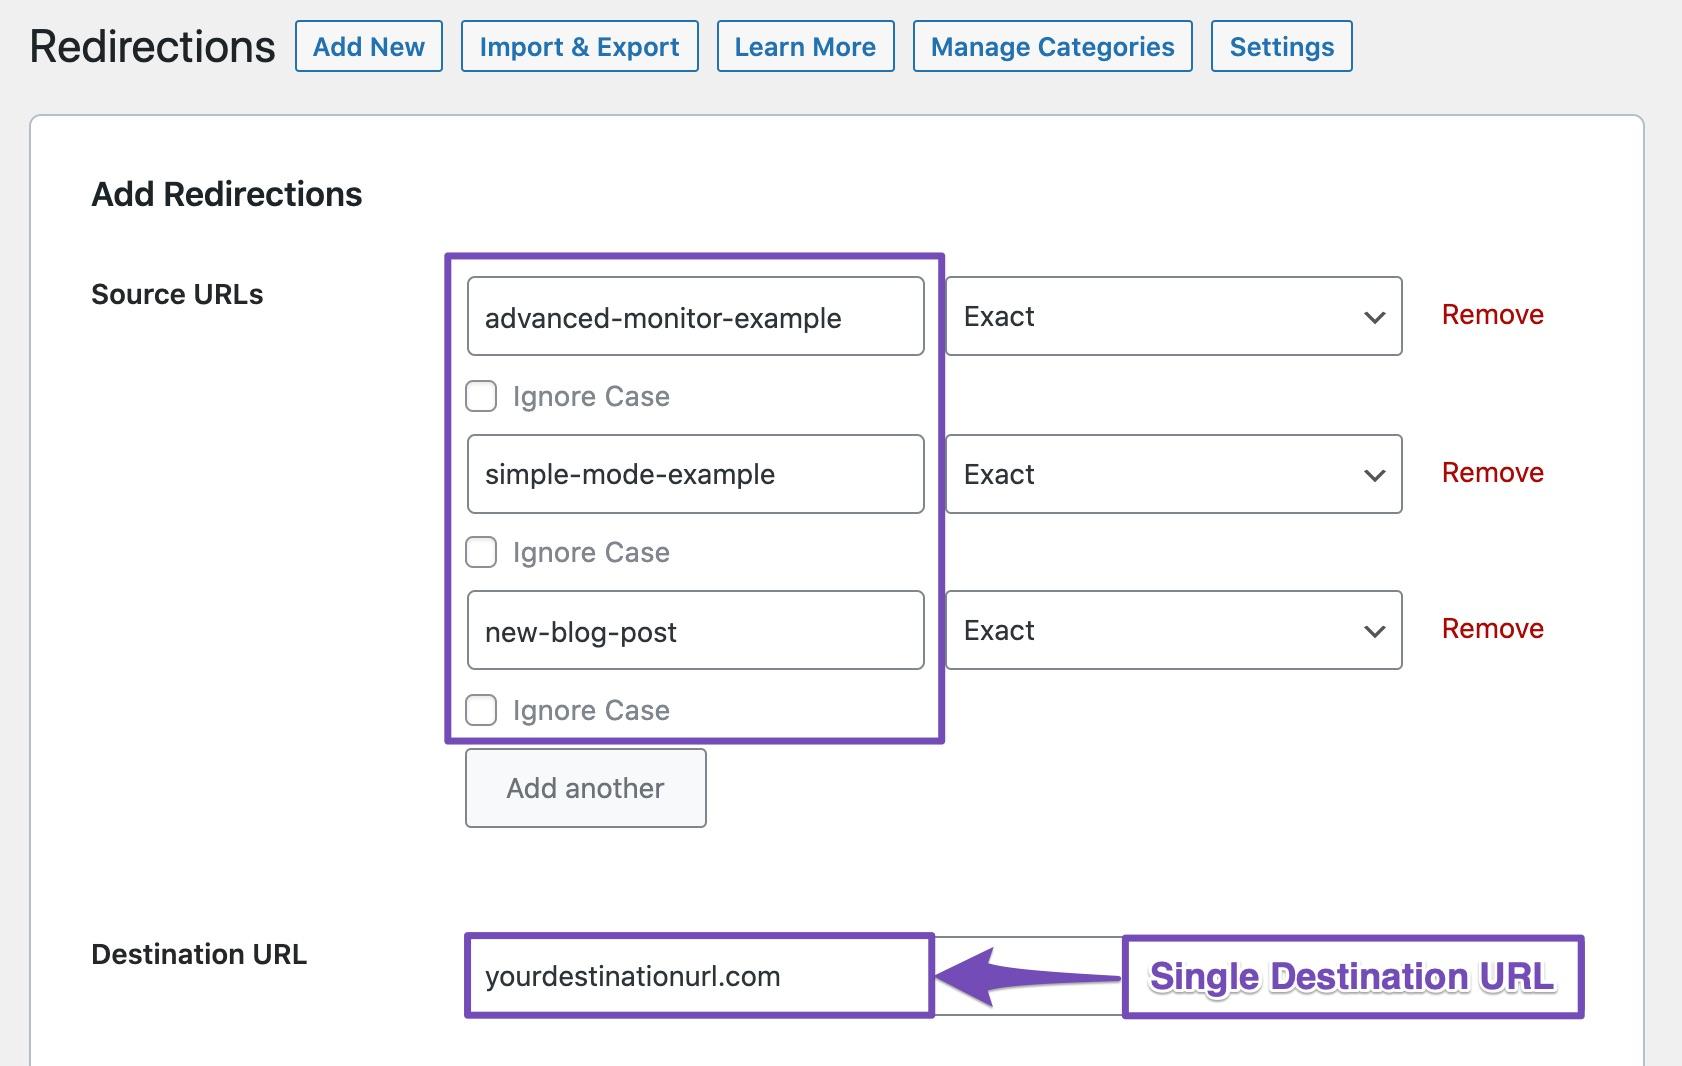 All redirected URLs will have single destination URL